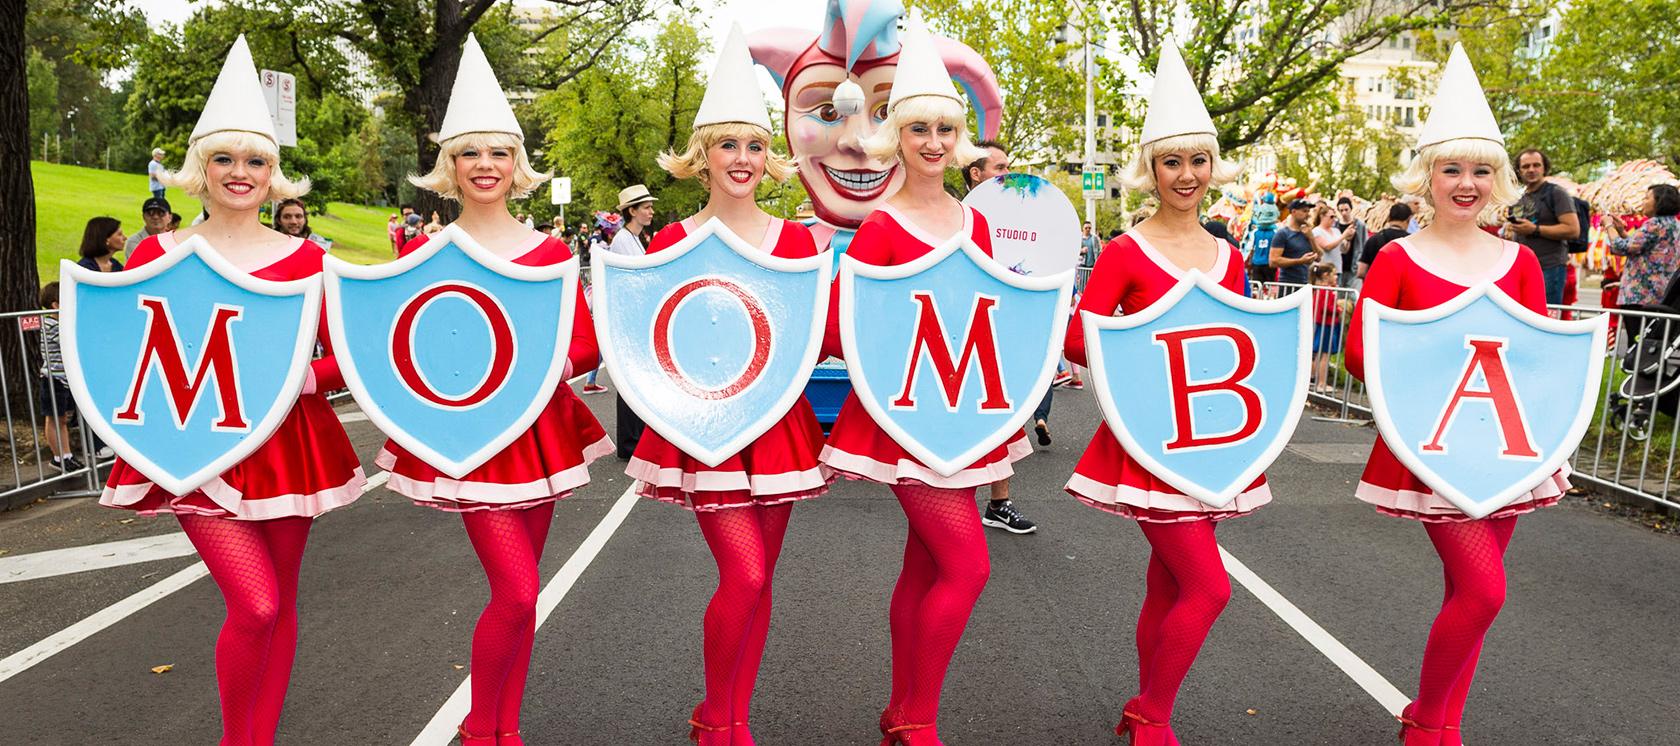 Moomba festival melbourne